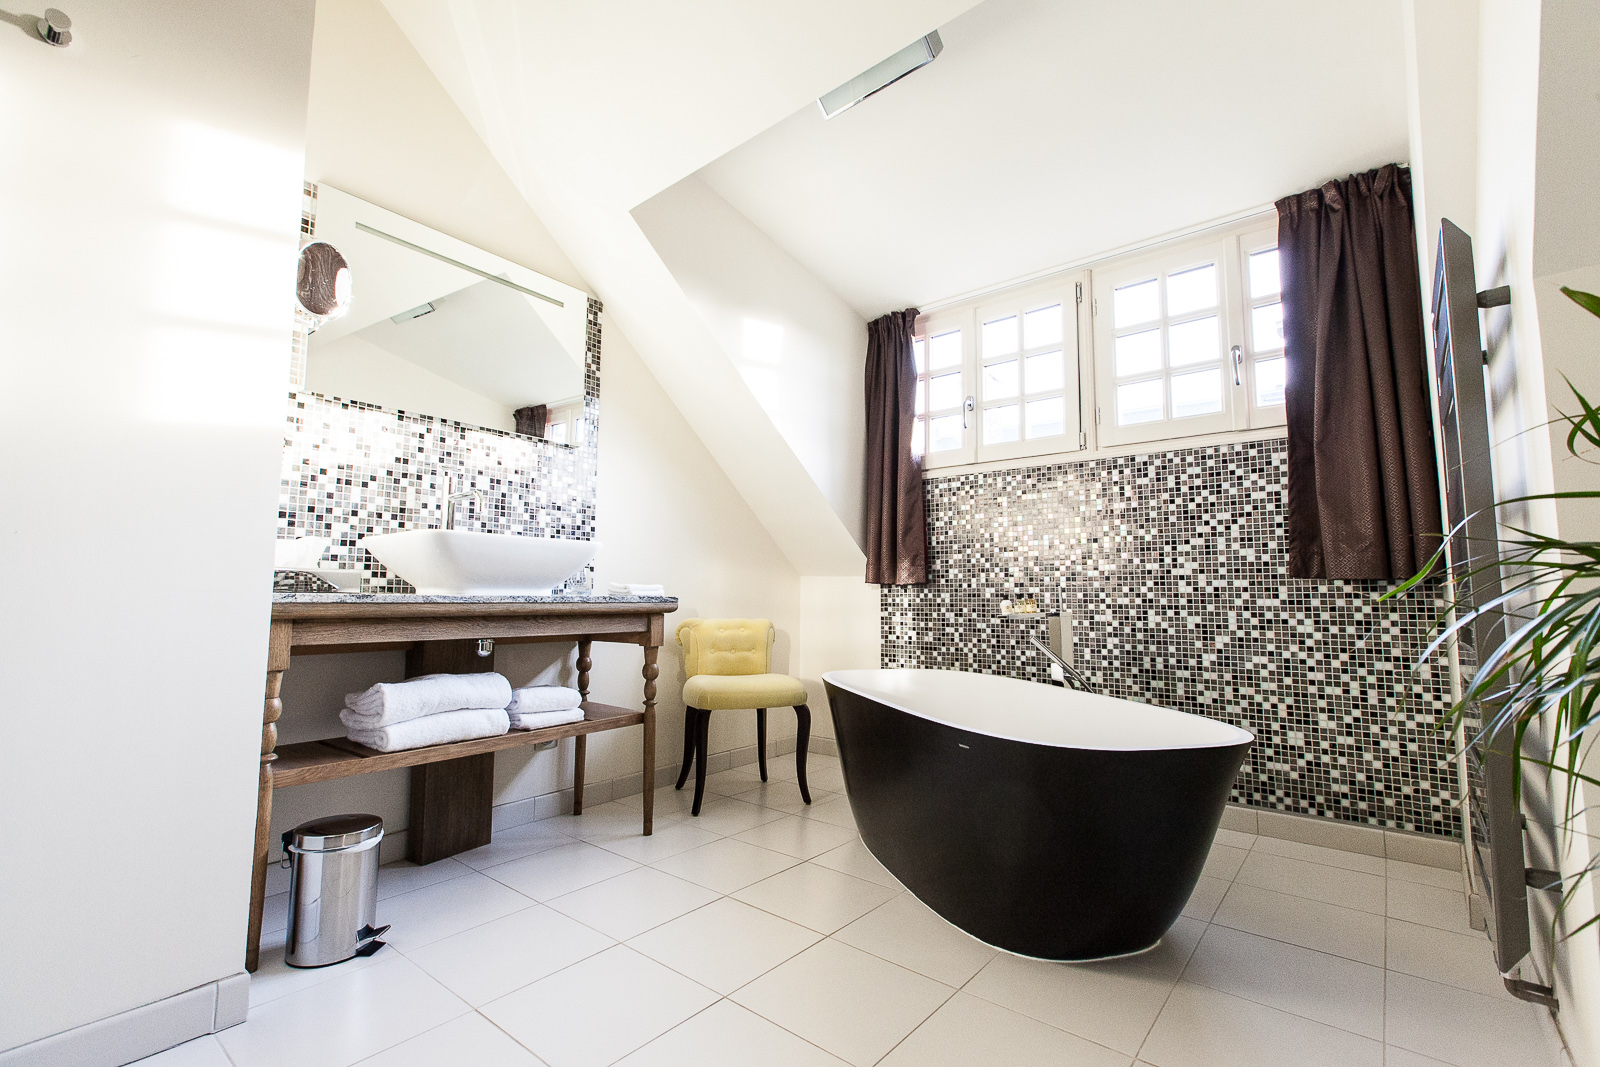 Hotel Marotte amiens chambre superieur baignoire